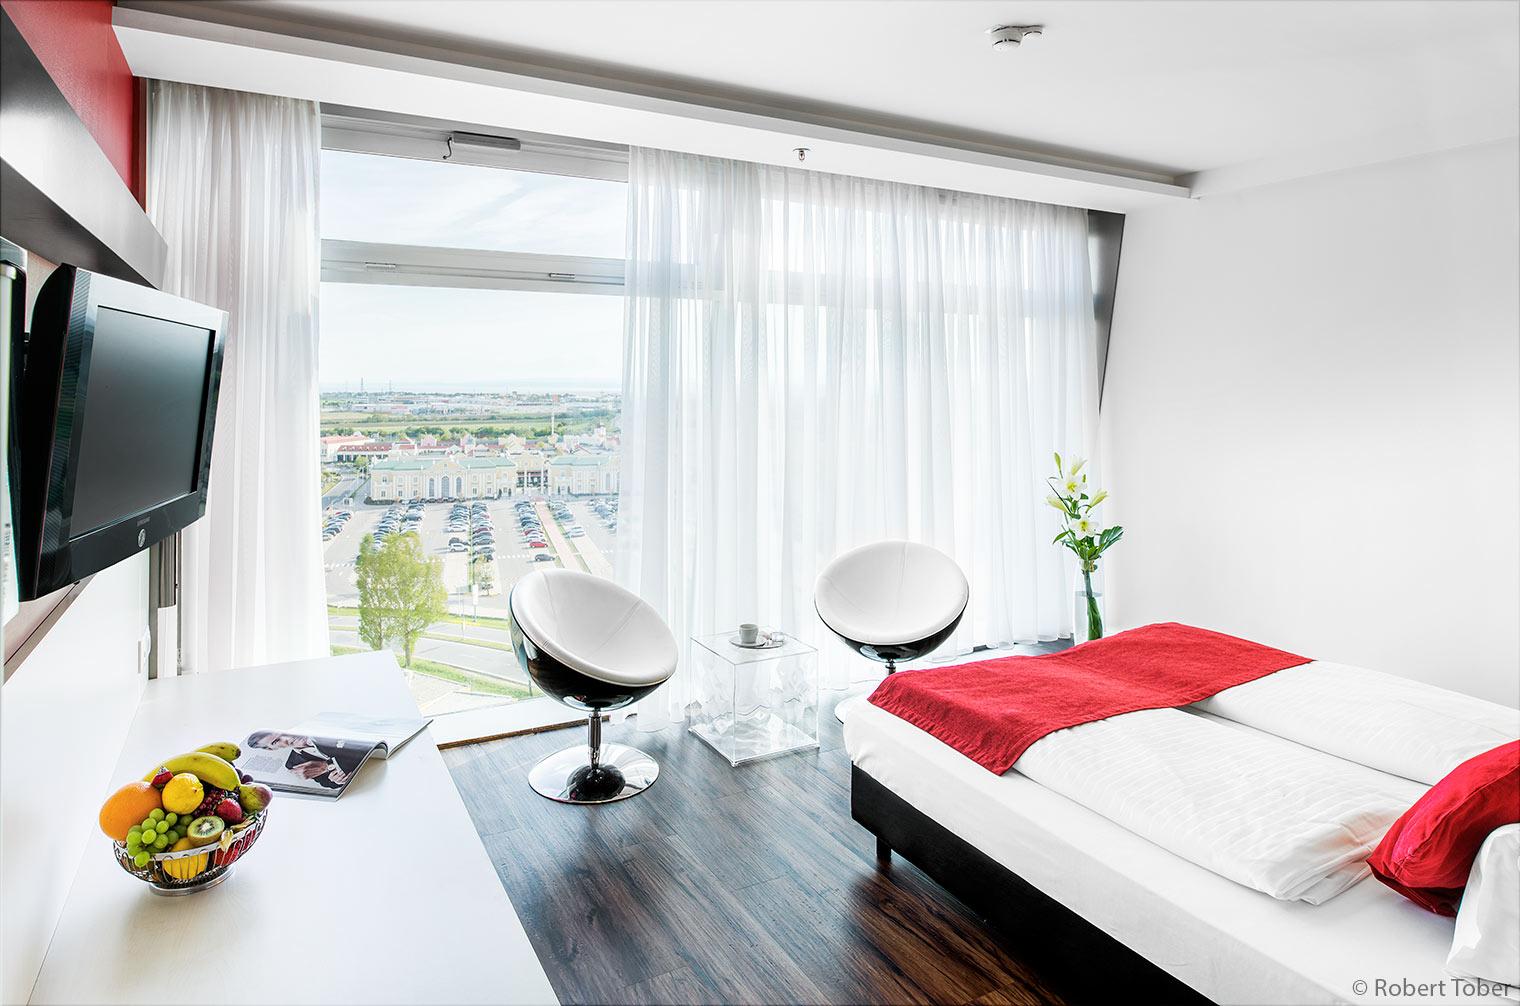 Pannonia Tower Hotel Parndorf / Austria © Robert Tober